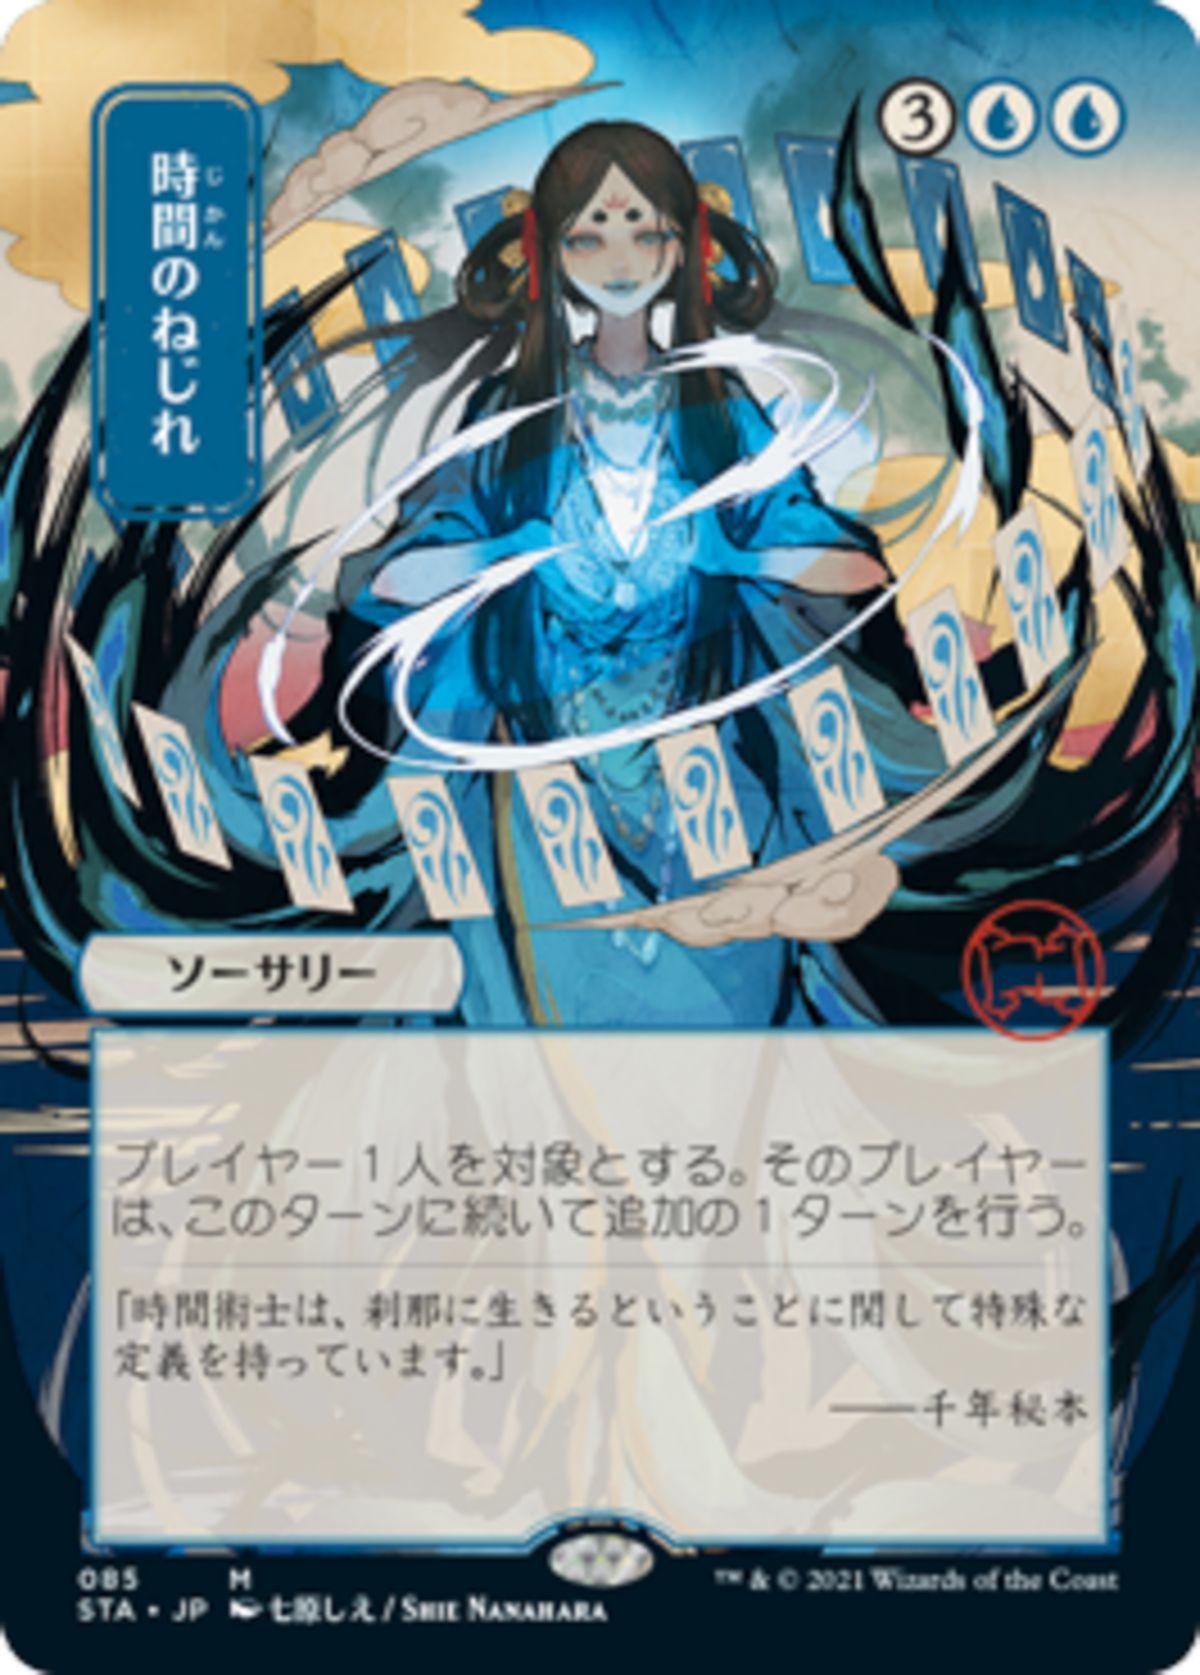 Time Warp's Japanese variant.